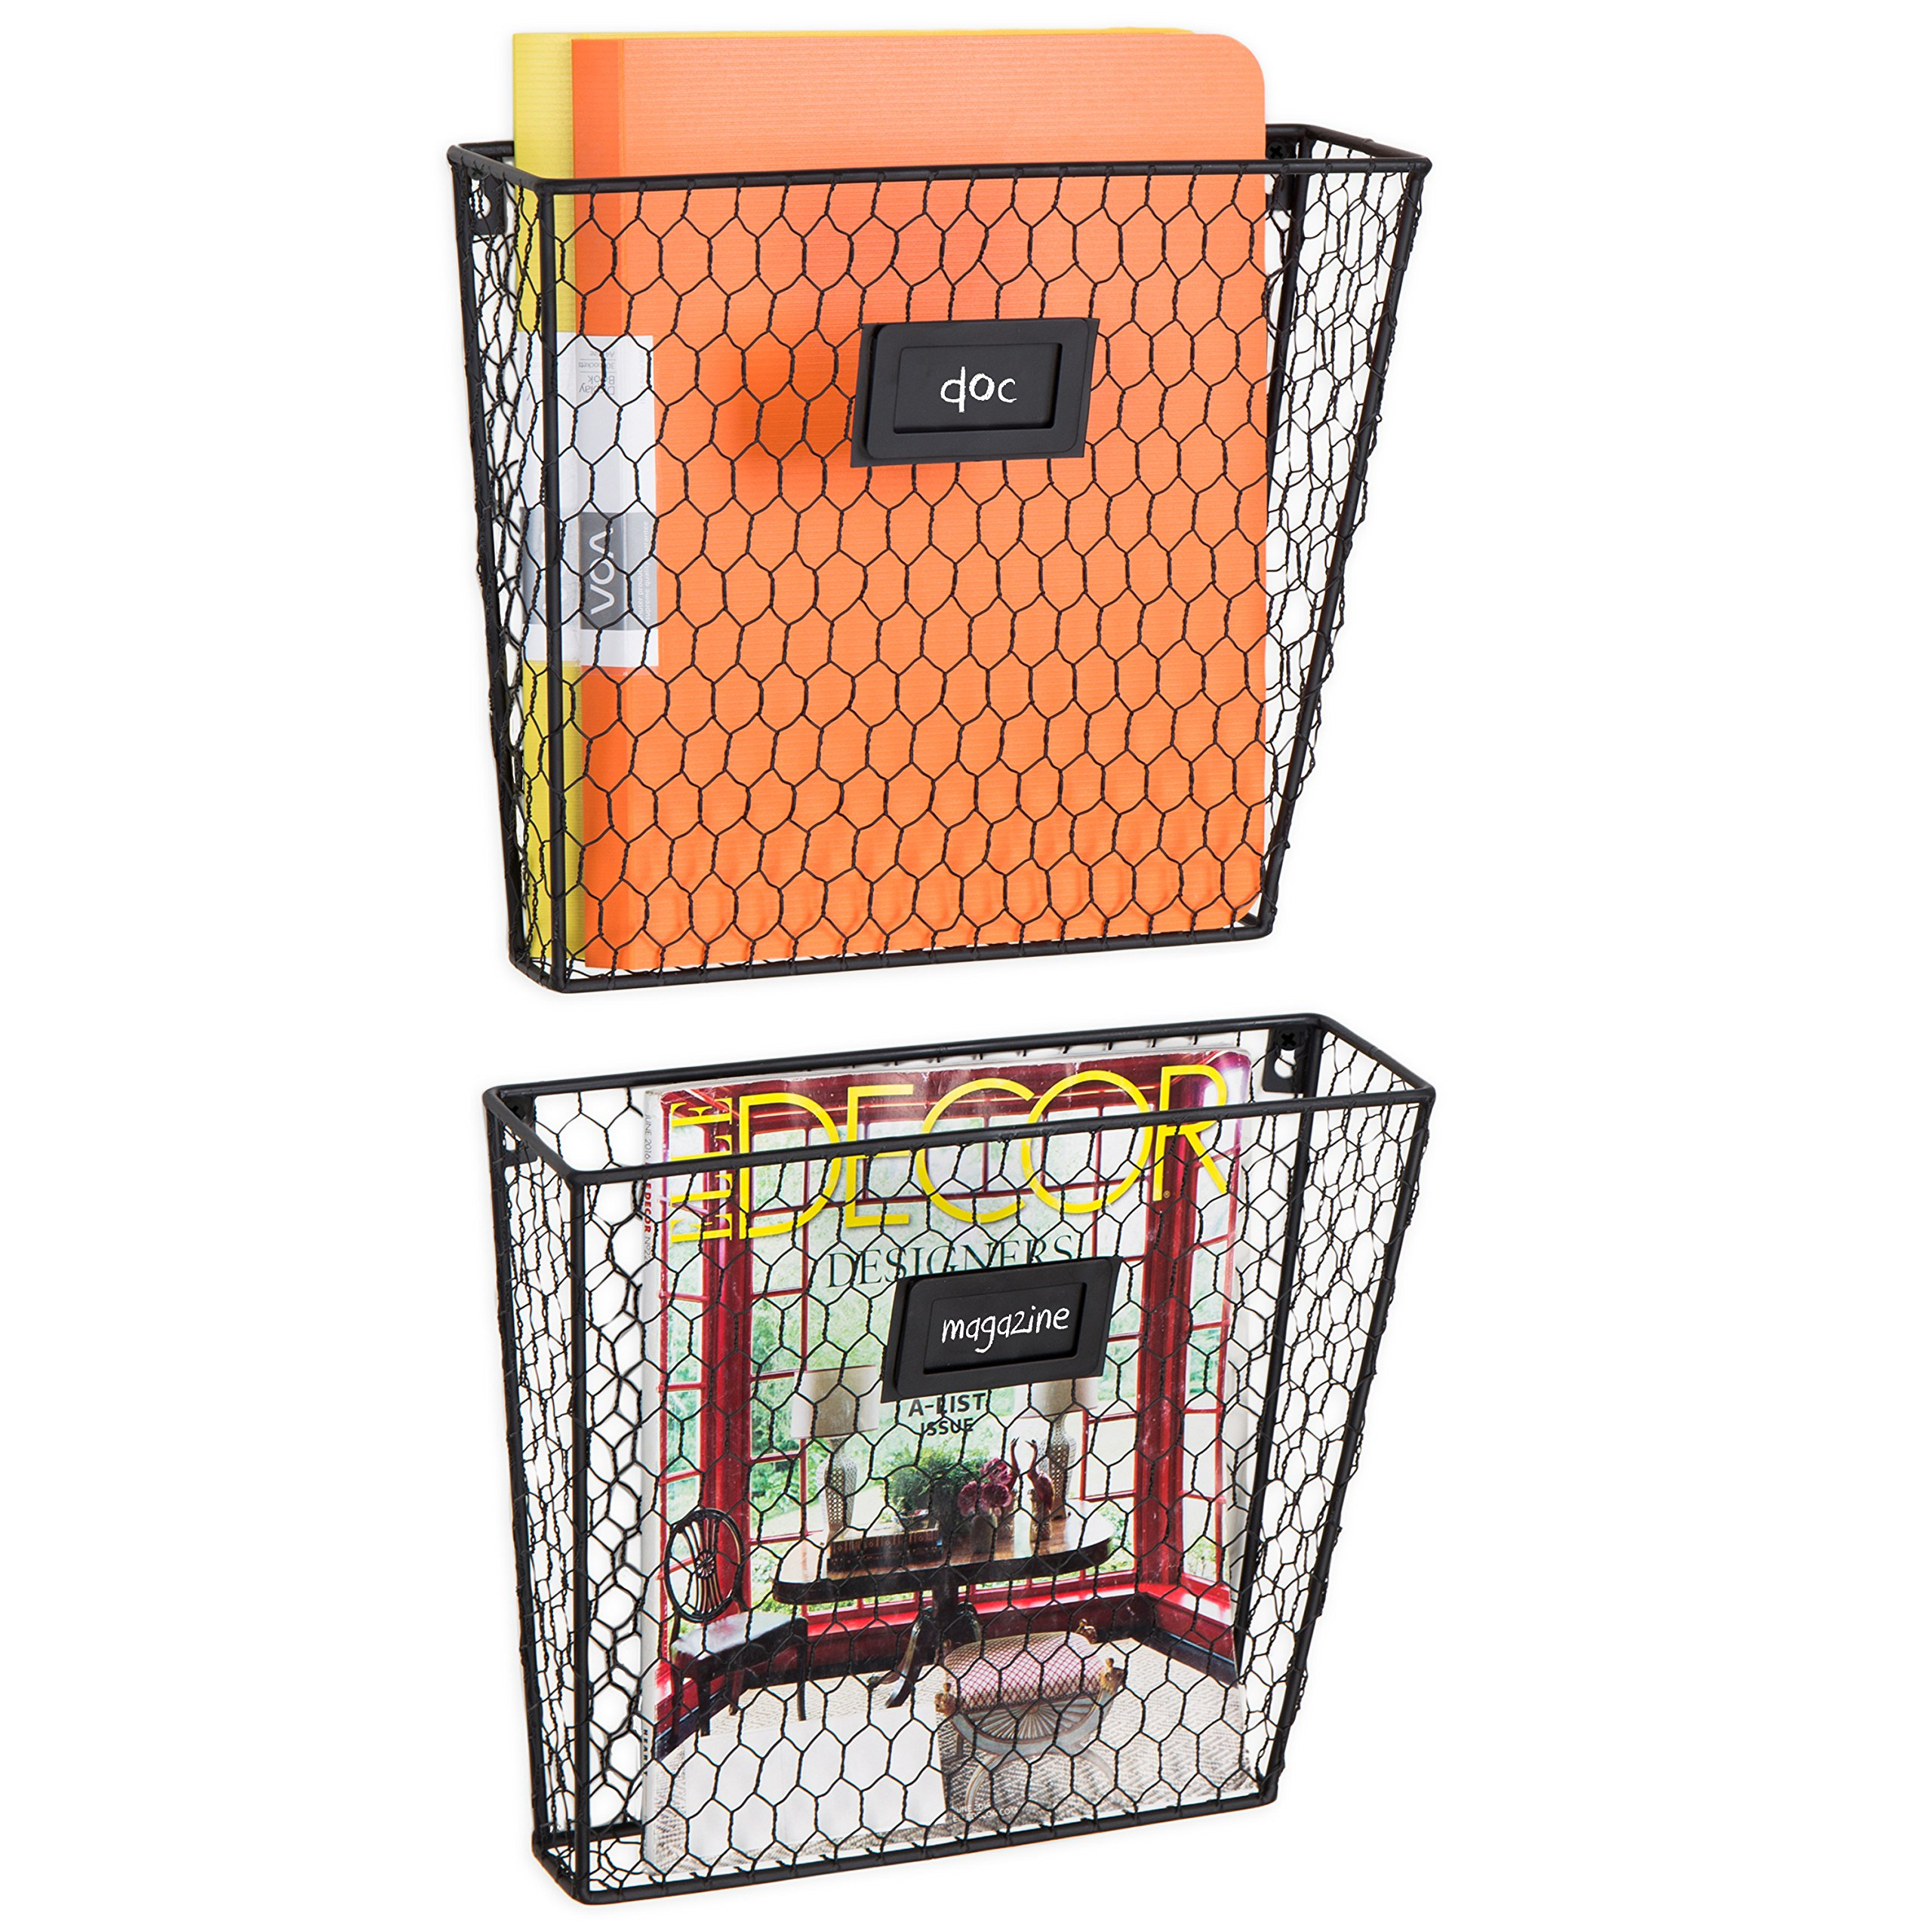 MyGift Rustic Chicken Wire Wall-Mounted Magazine & File Folder Baskets w/Chalkboard Label Inserts, Set of 2 by MyGift (Image #3)